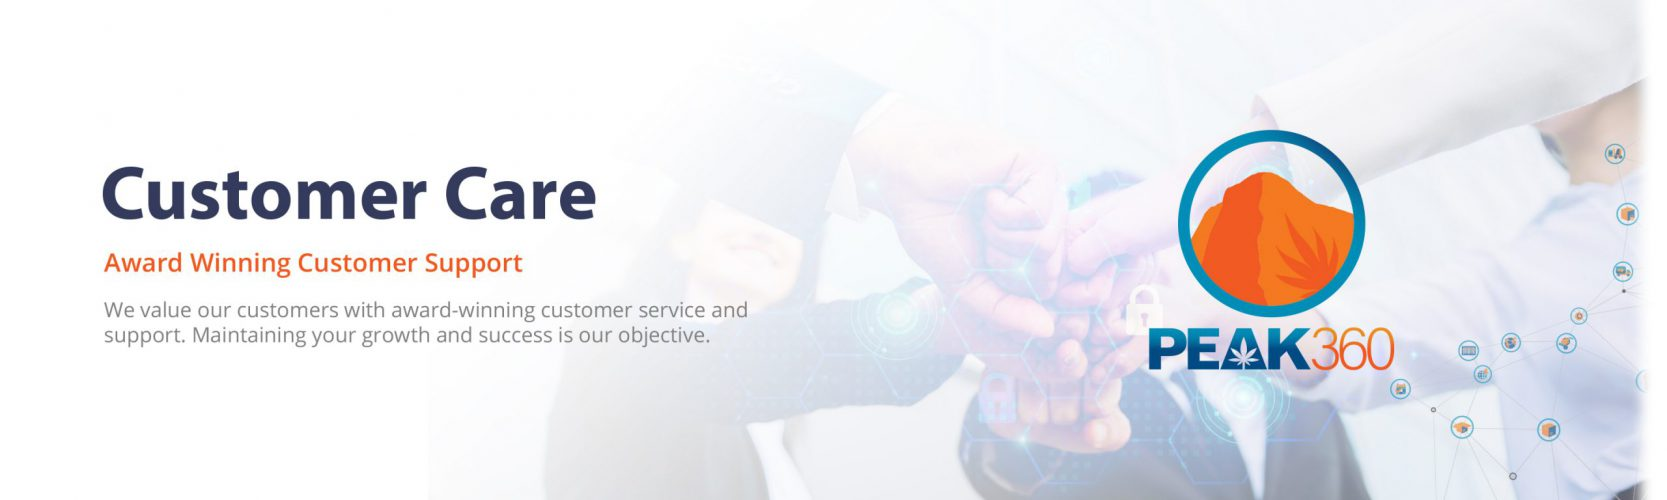 CustomerCare_Header_Content